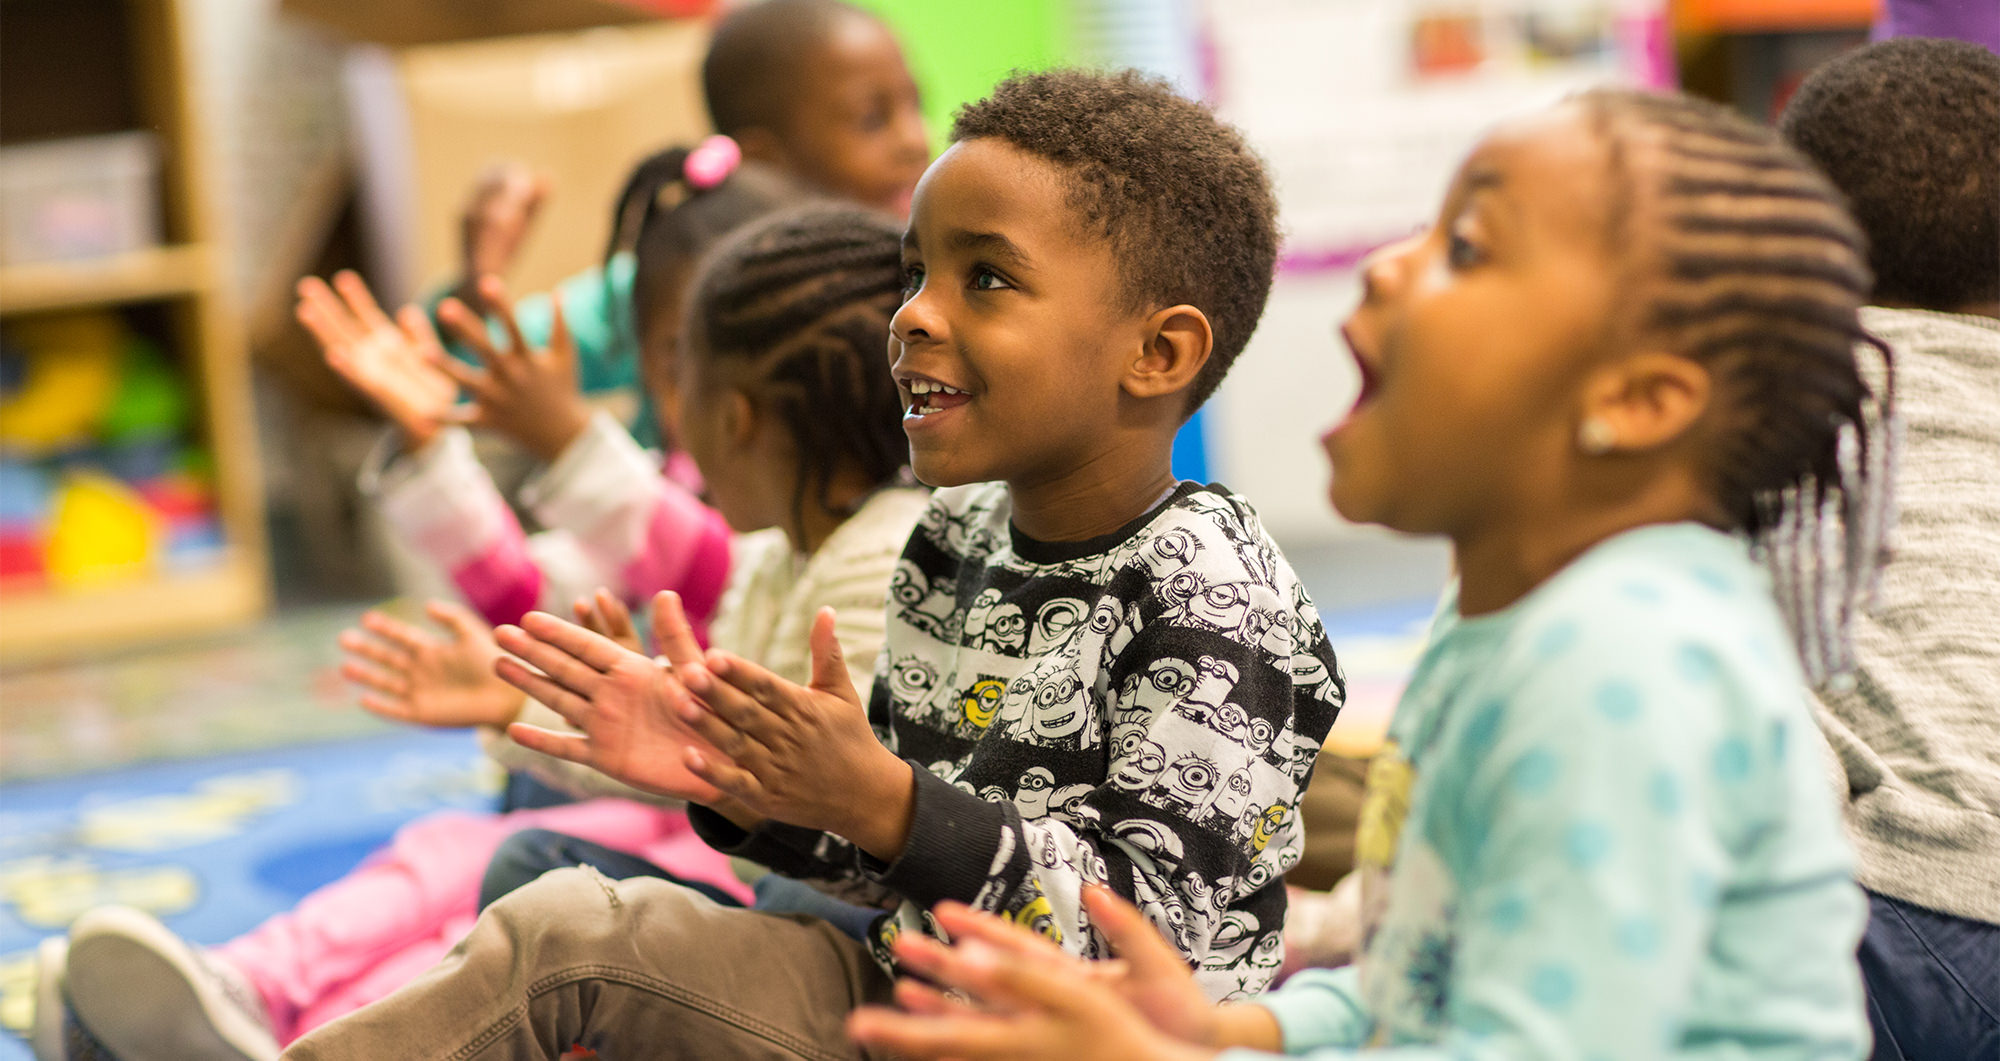 Children enjoying preschool